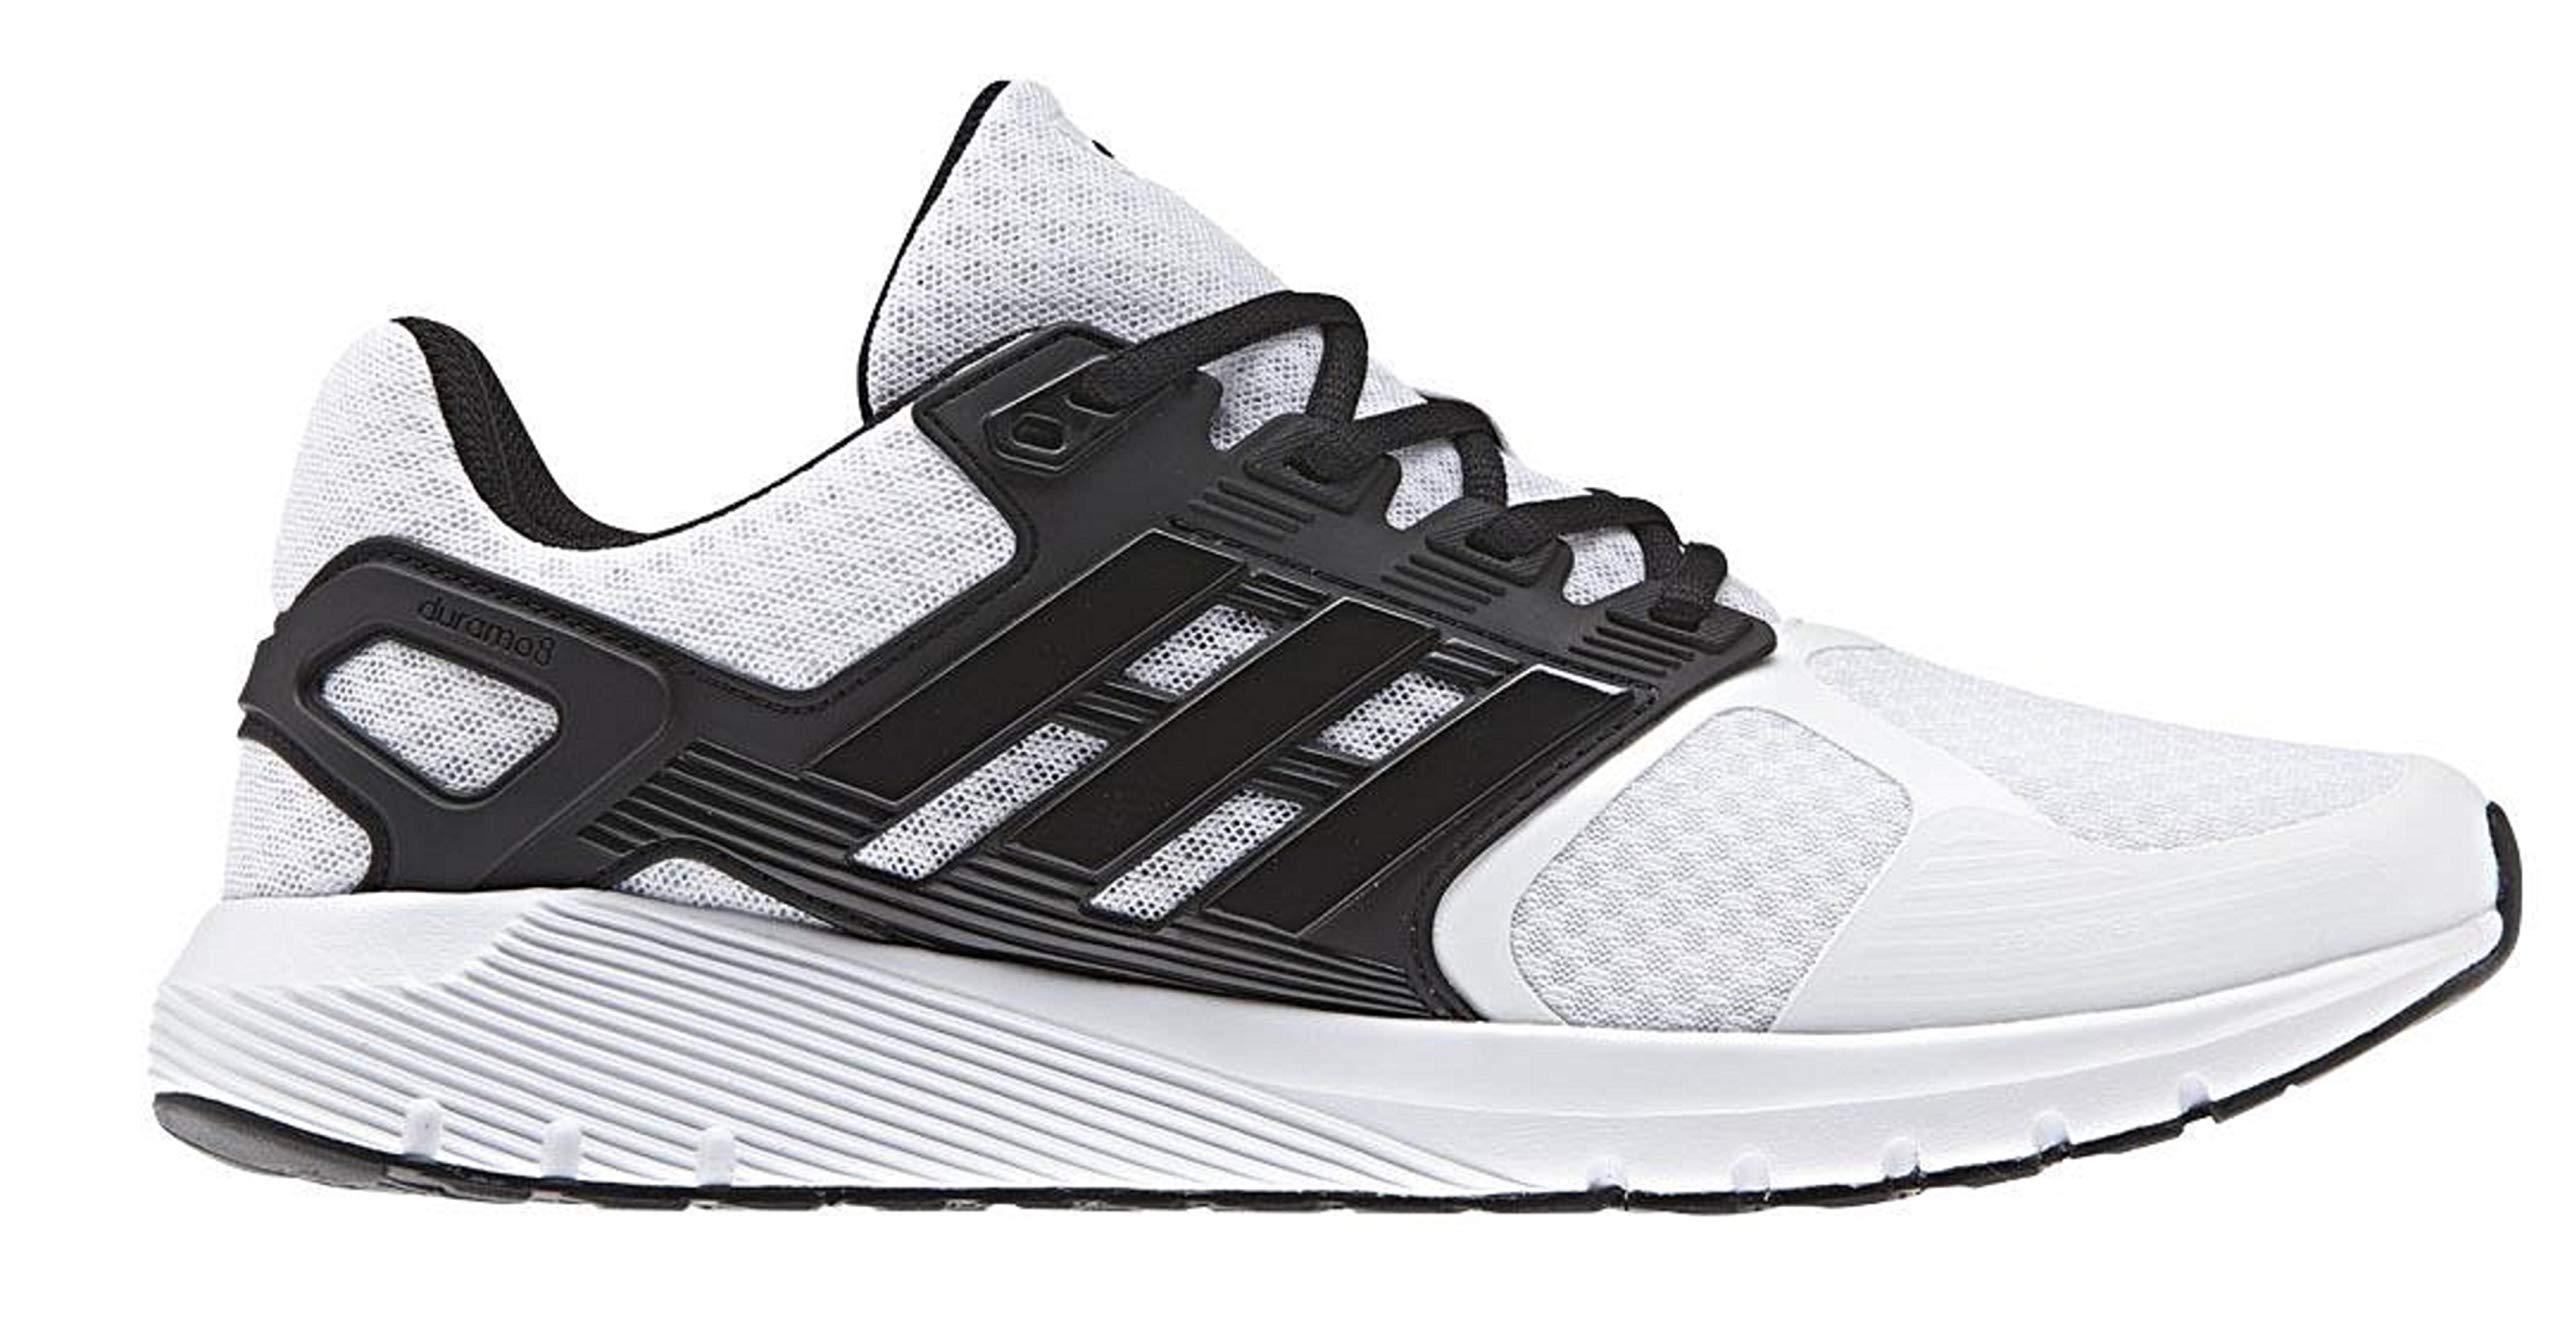 eb677e3fdf1 Galleon - Adidas Performance Men's Duramo 8 M Running Shoe, (10 M US,  FTWWHITE/CBLACK/CBLACK)